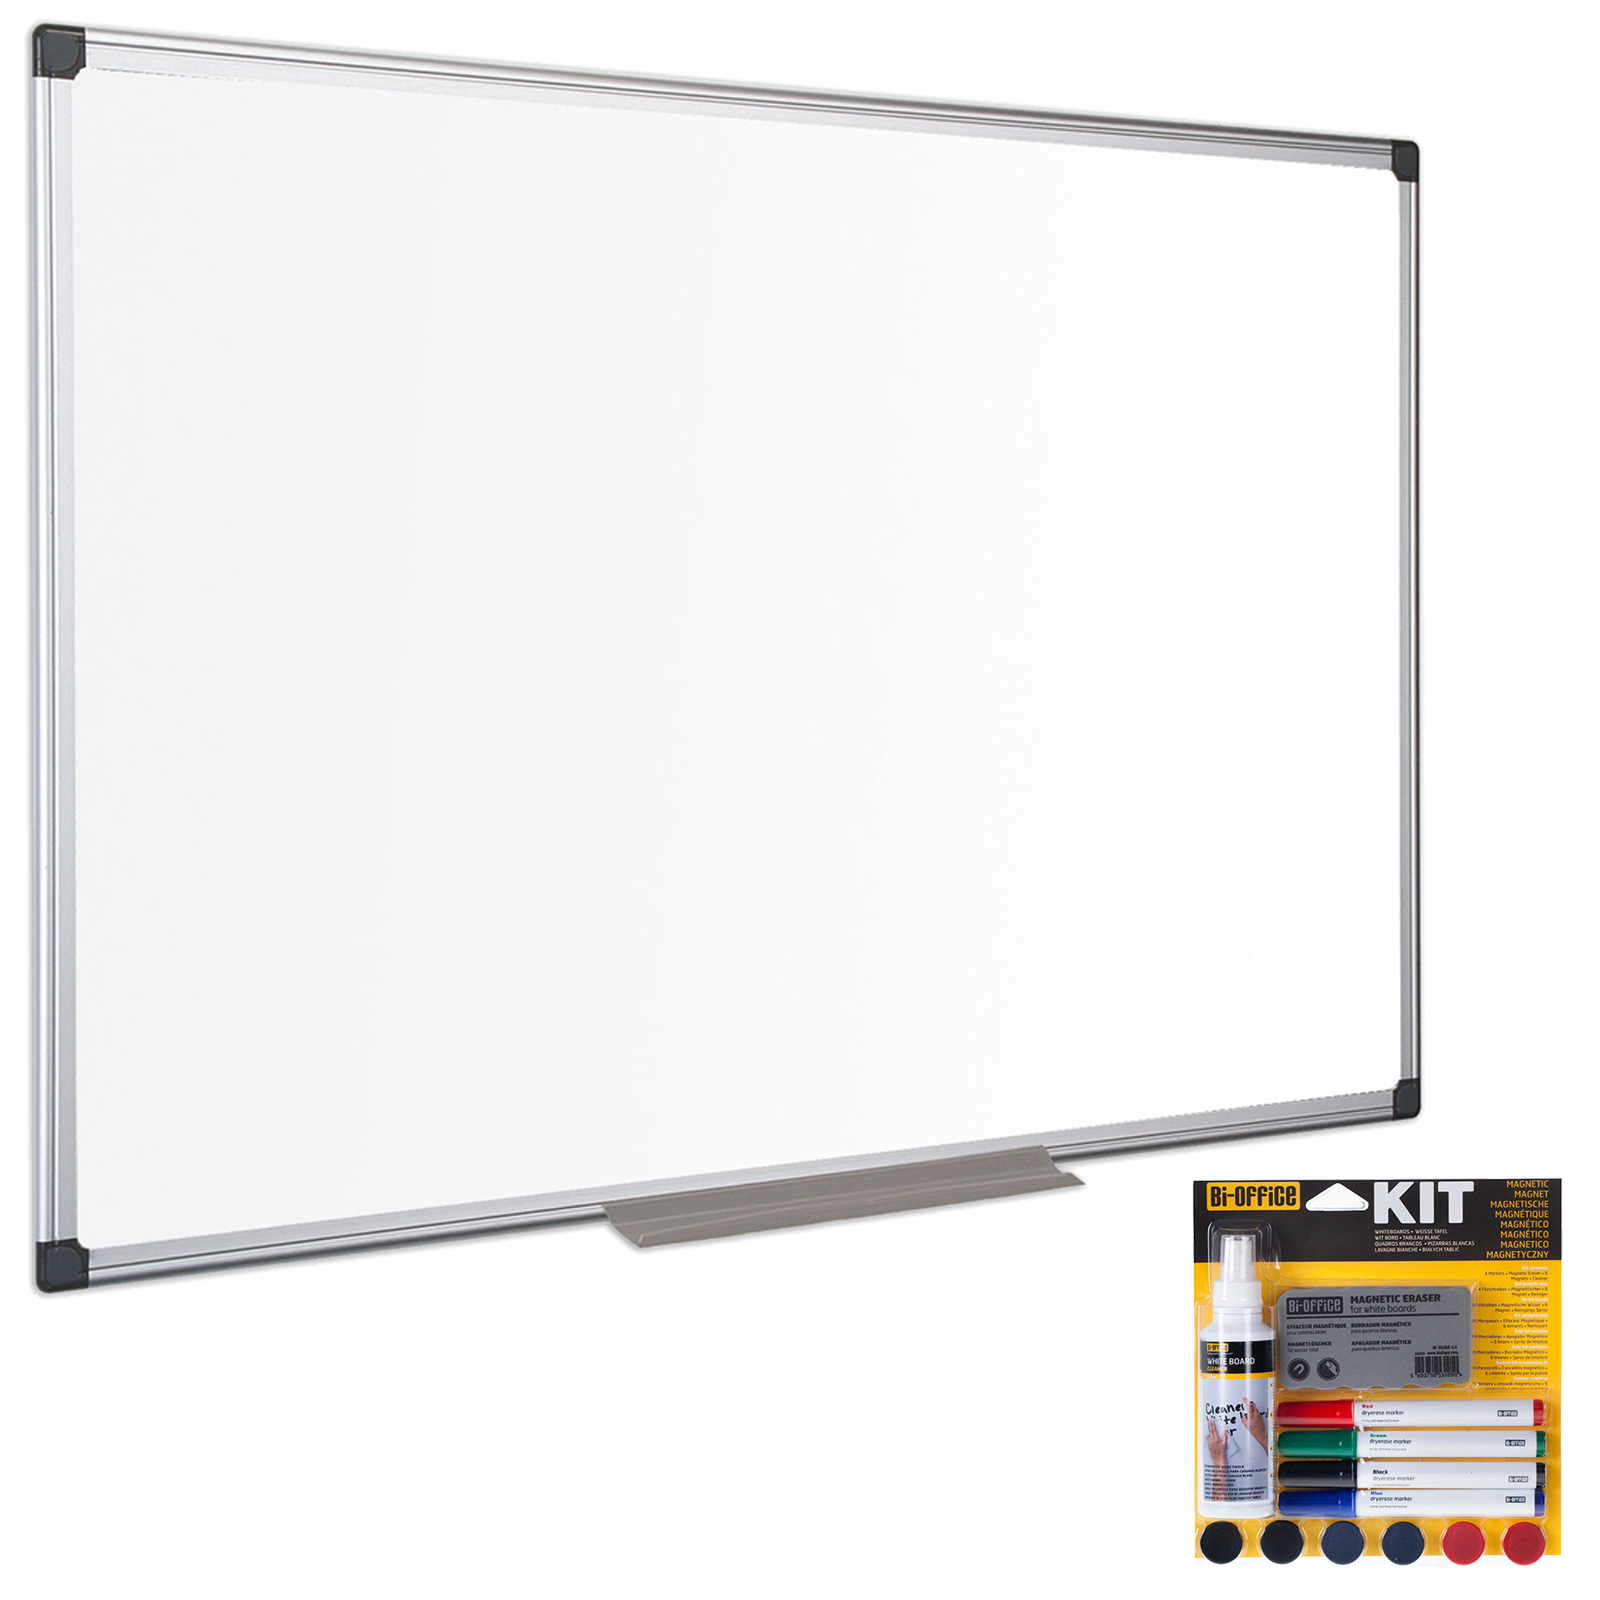 Bi office tableau blanc maill 90 x 60 cm bi office kit for Tableau blanc pas cher